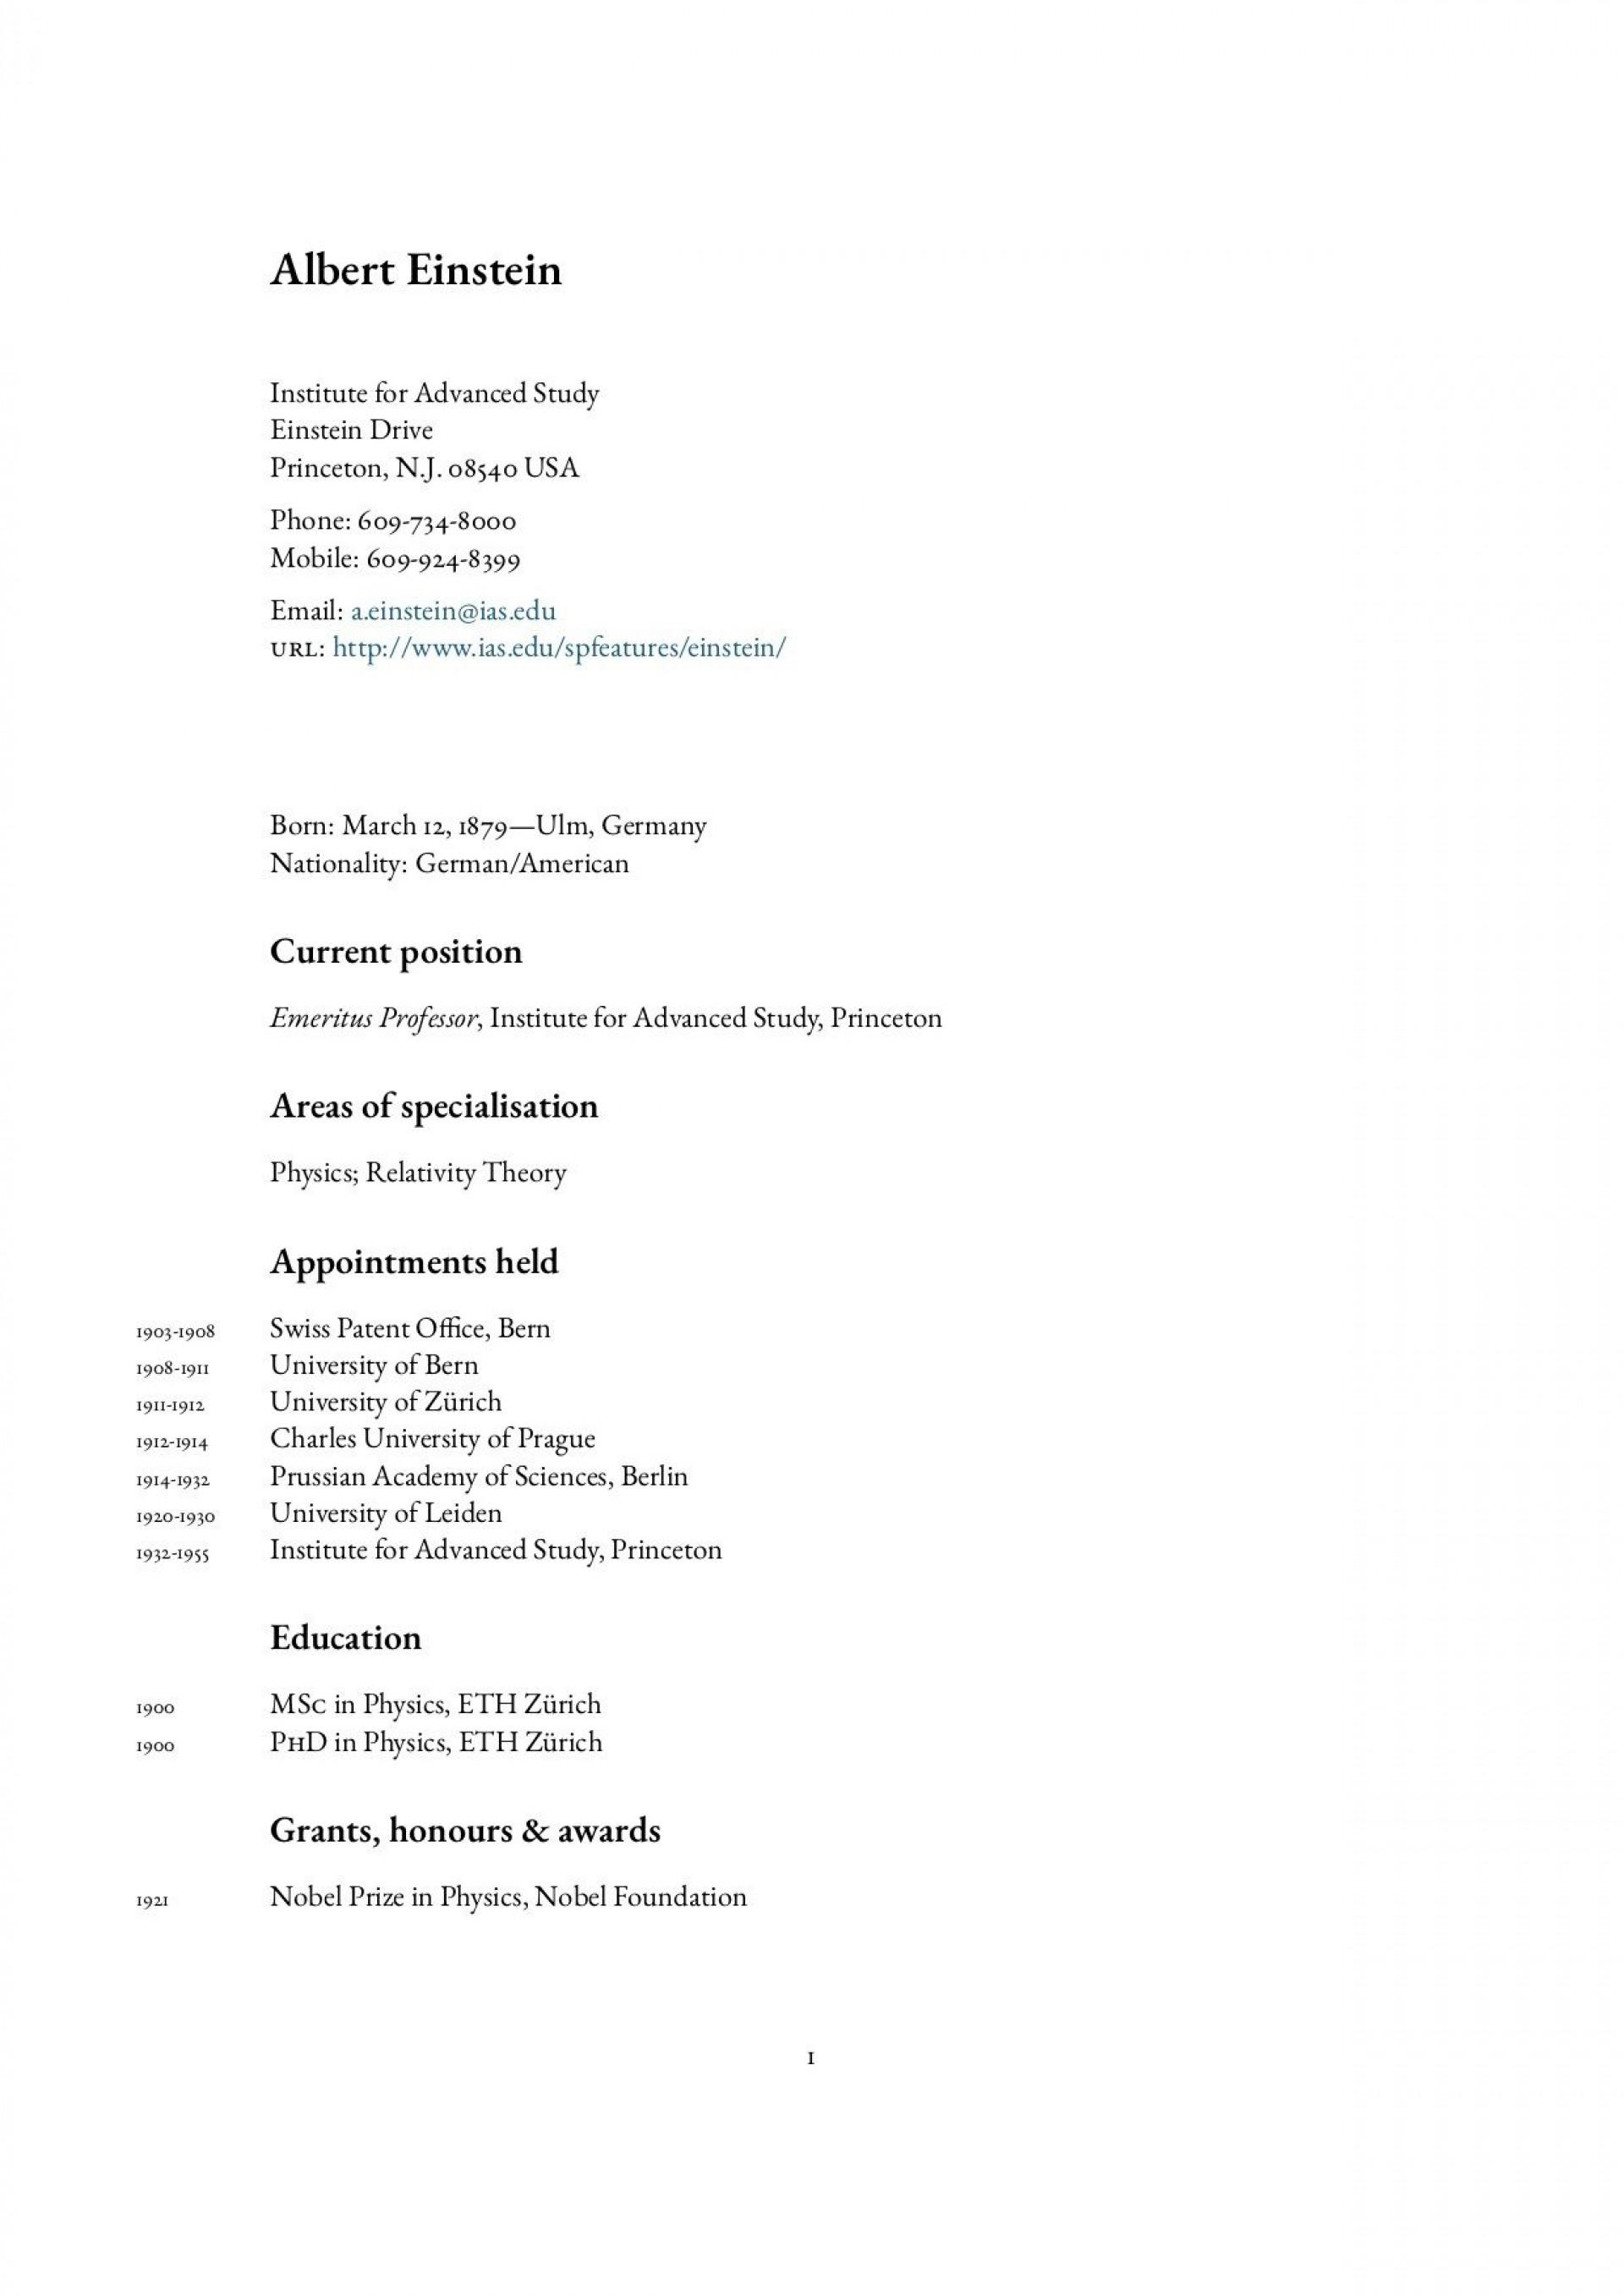 001 Imposing Graduate School Curriculum Vitae Template Picture  For Application Resume Format1920